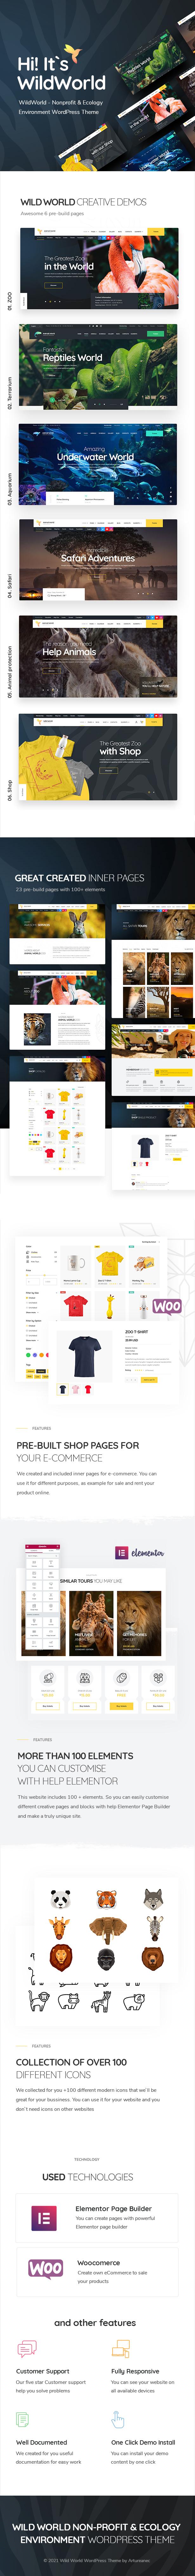 WildWorld | Nonprofit & Ecology WordPress Theme - 2